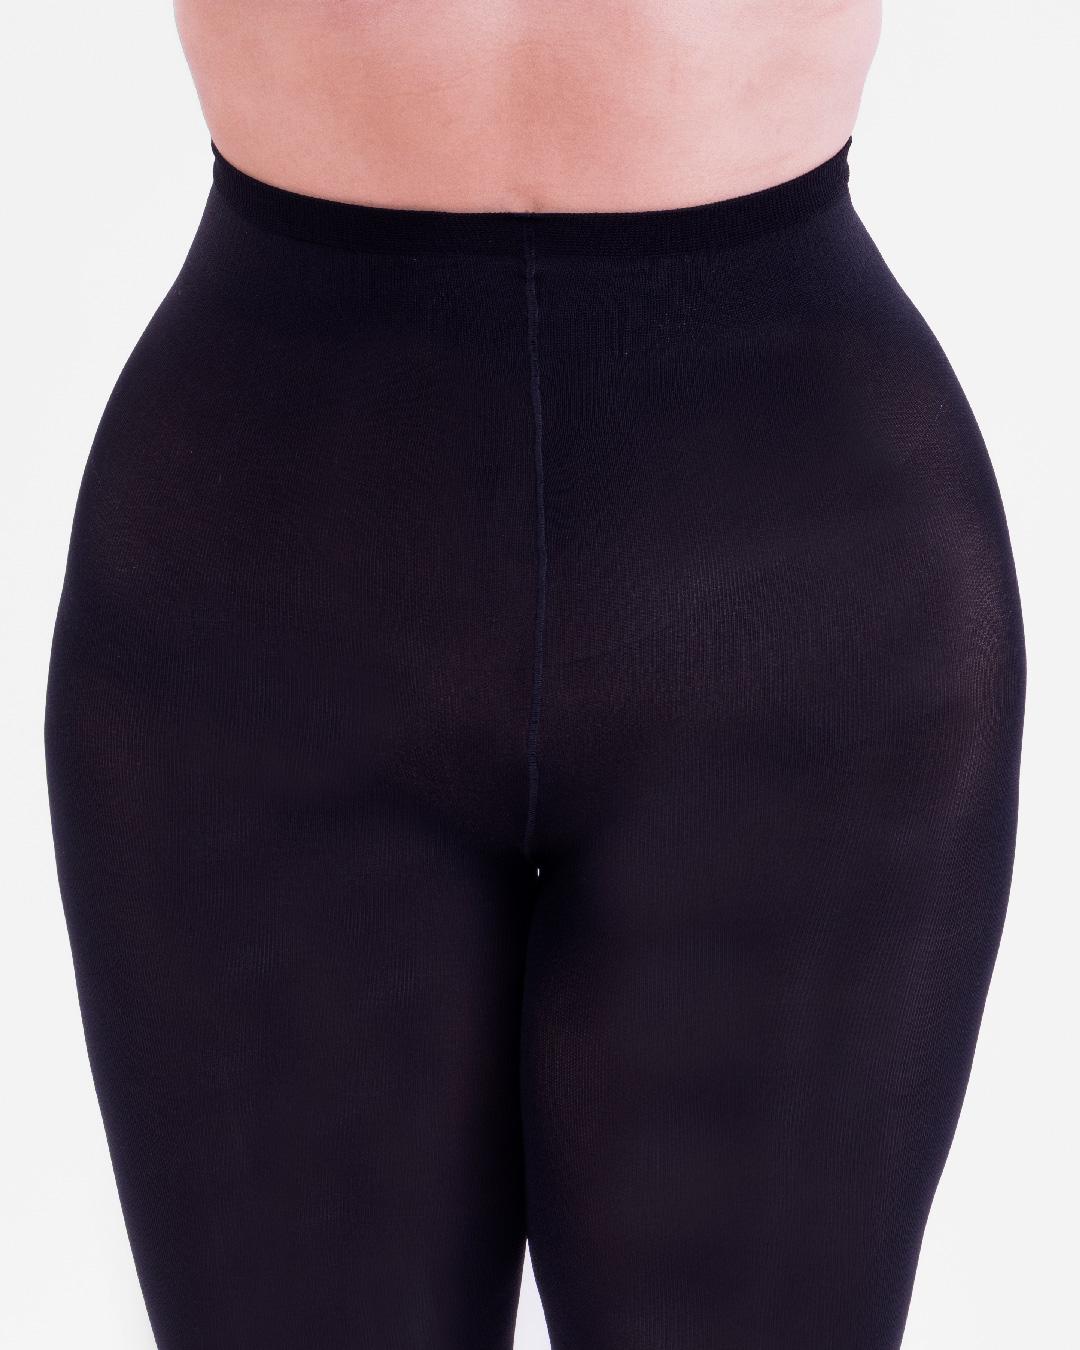 personalsize-exclusive-leggings-exclusive-prd_005.jpg